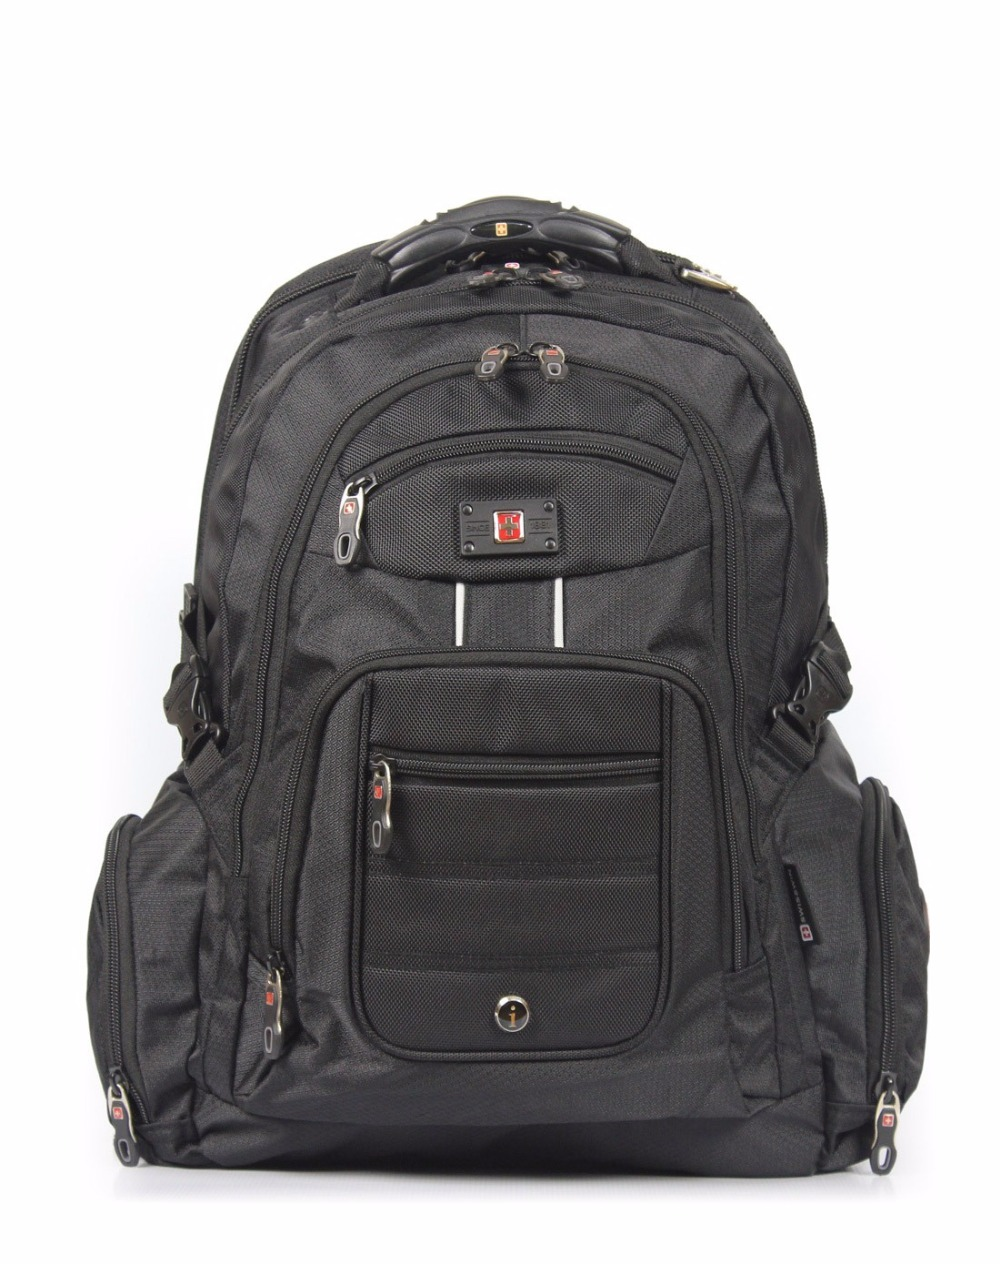 Suissewin 17 Laptop Bag Men's Laptop Backpack Waterproof Nylon Backpack For Business Travel Large Capacity Backpack mochila coolbell 15 17 backpack men laptop rucksack nylon school bag large capacity unisex women for business travel waterproof ff